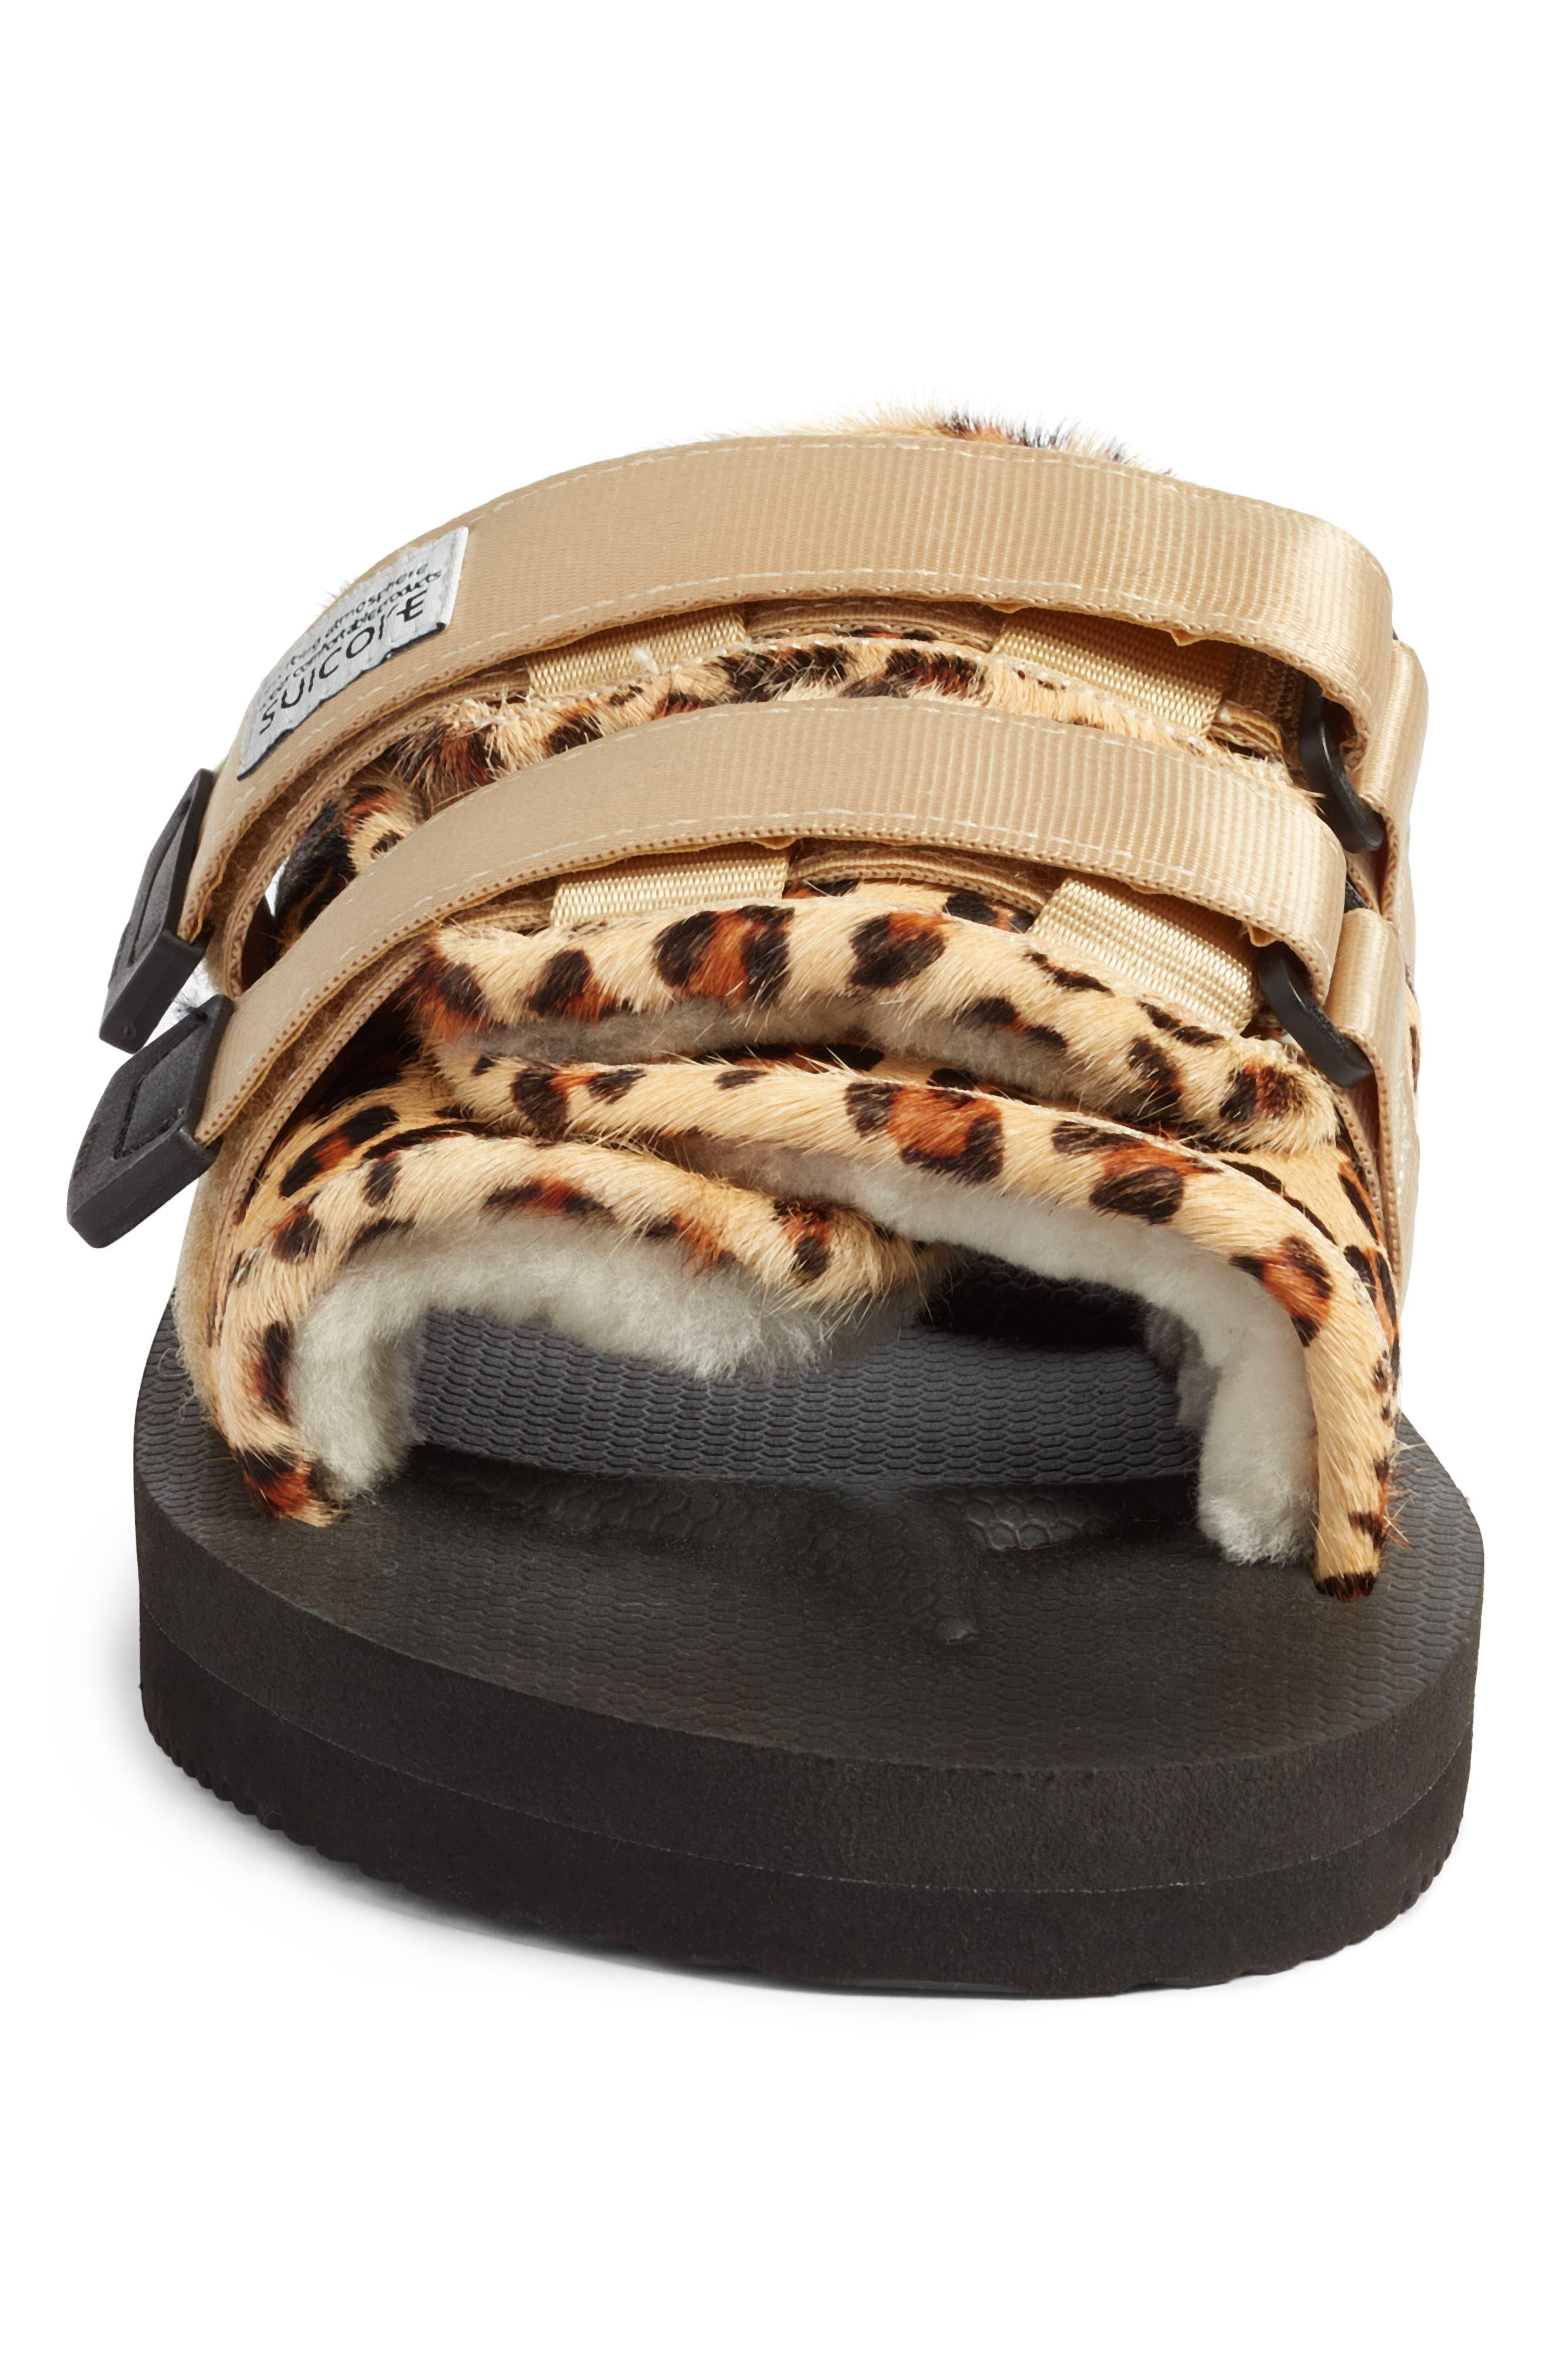 Moto Cab Genuine Calf Hair Slide Sandal,                             Alternate thumbnail 4, color,                             LEOPARD PRINT CALF HAIR